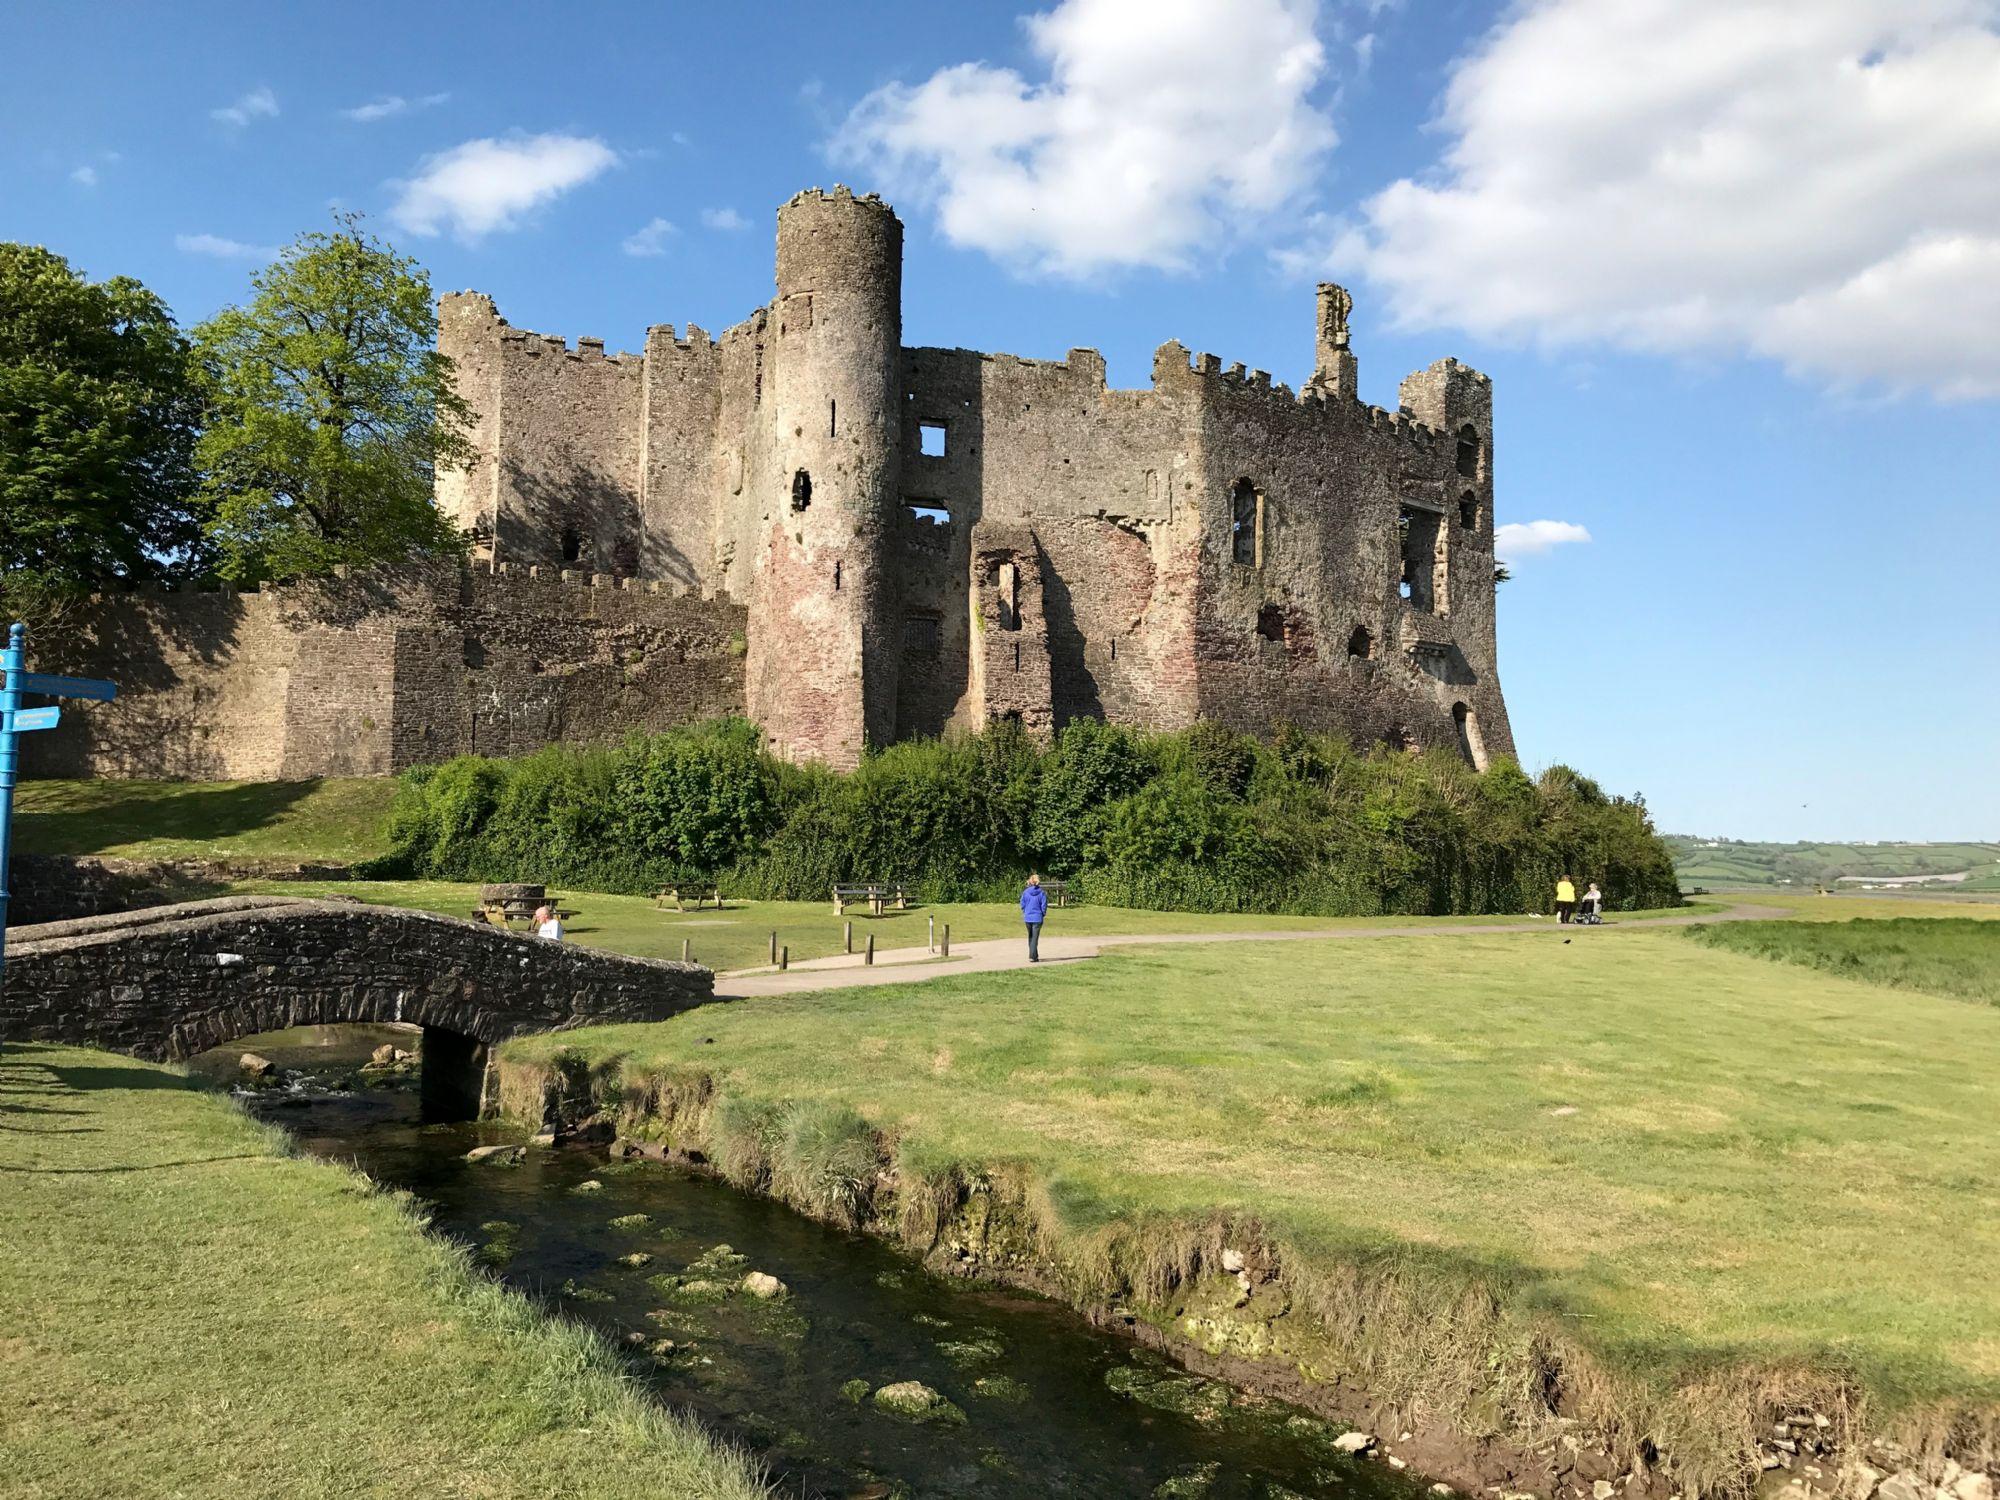 Lots of castles